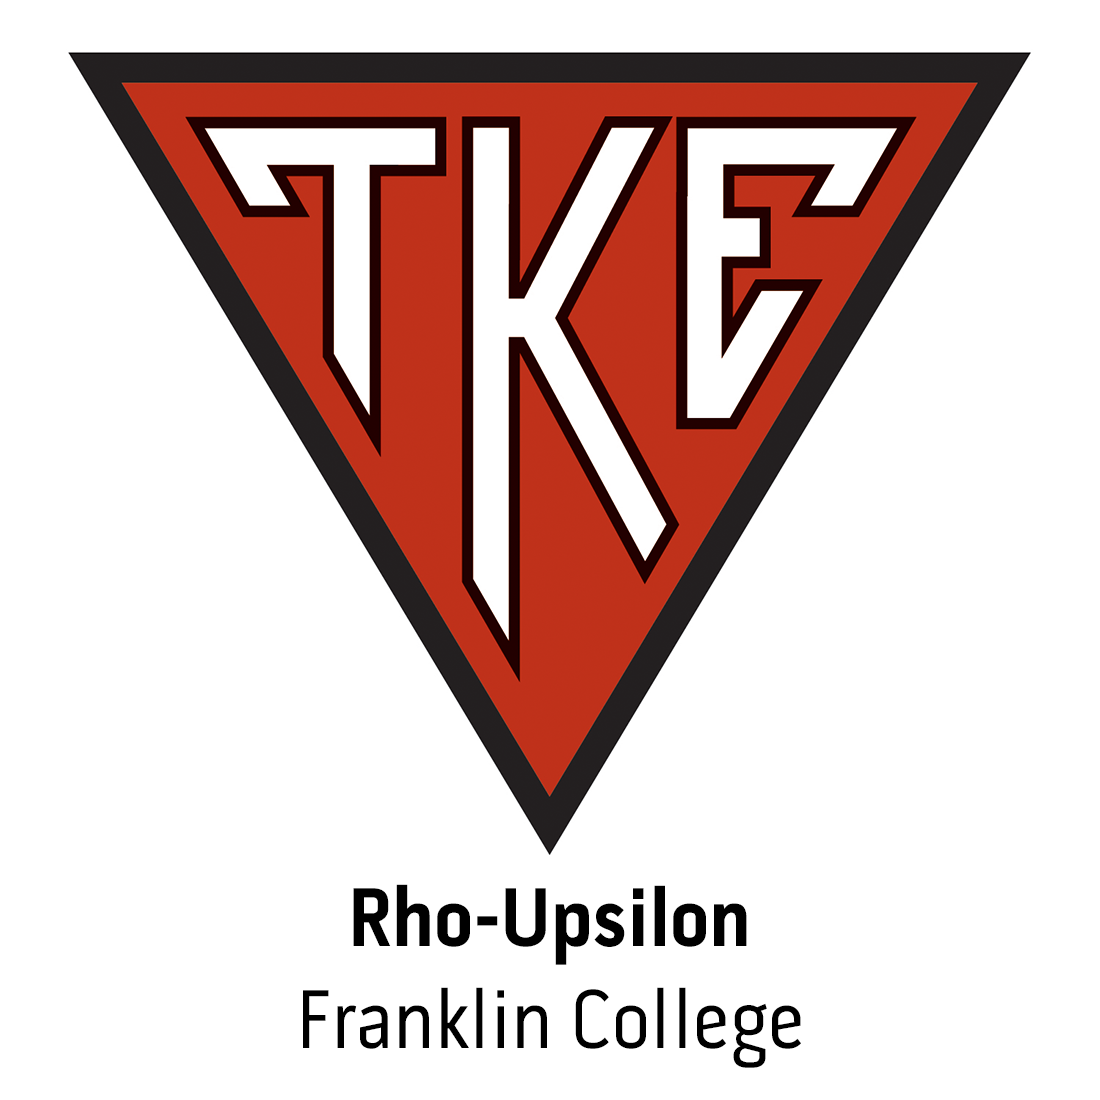 Rho-Upsilon Chapter at Franklin College